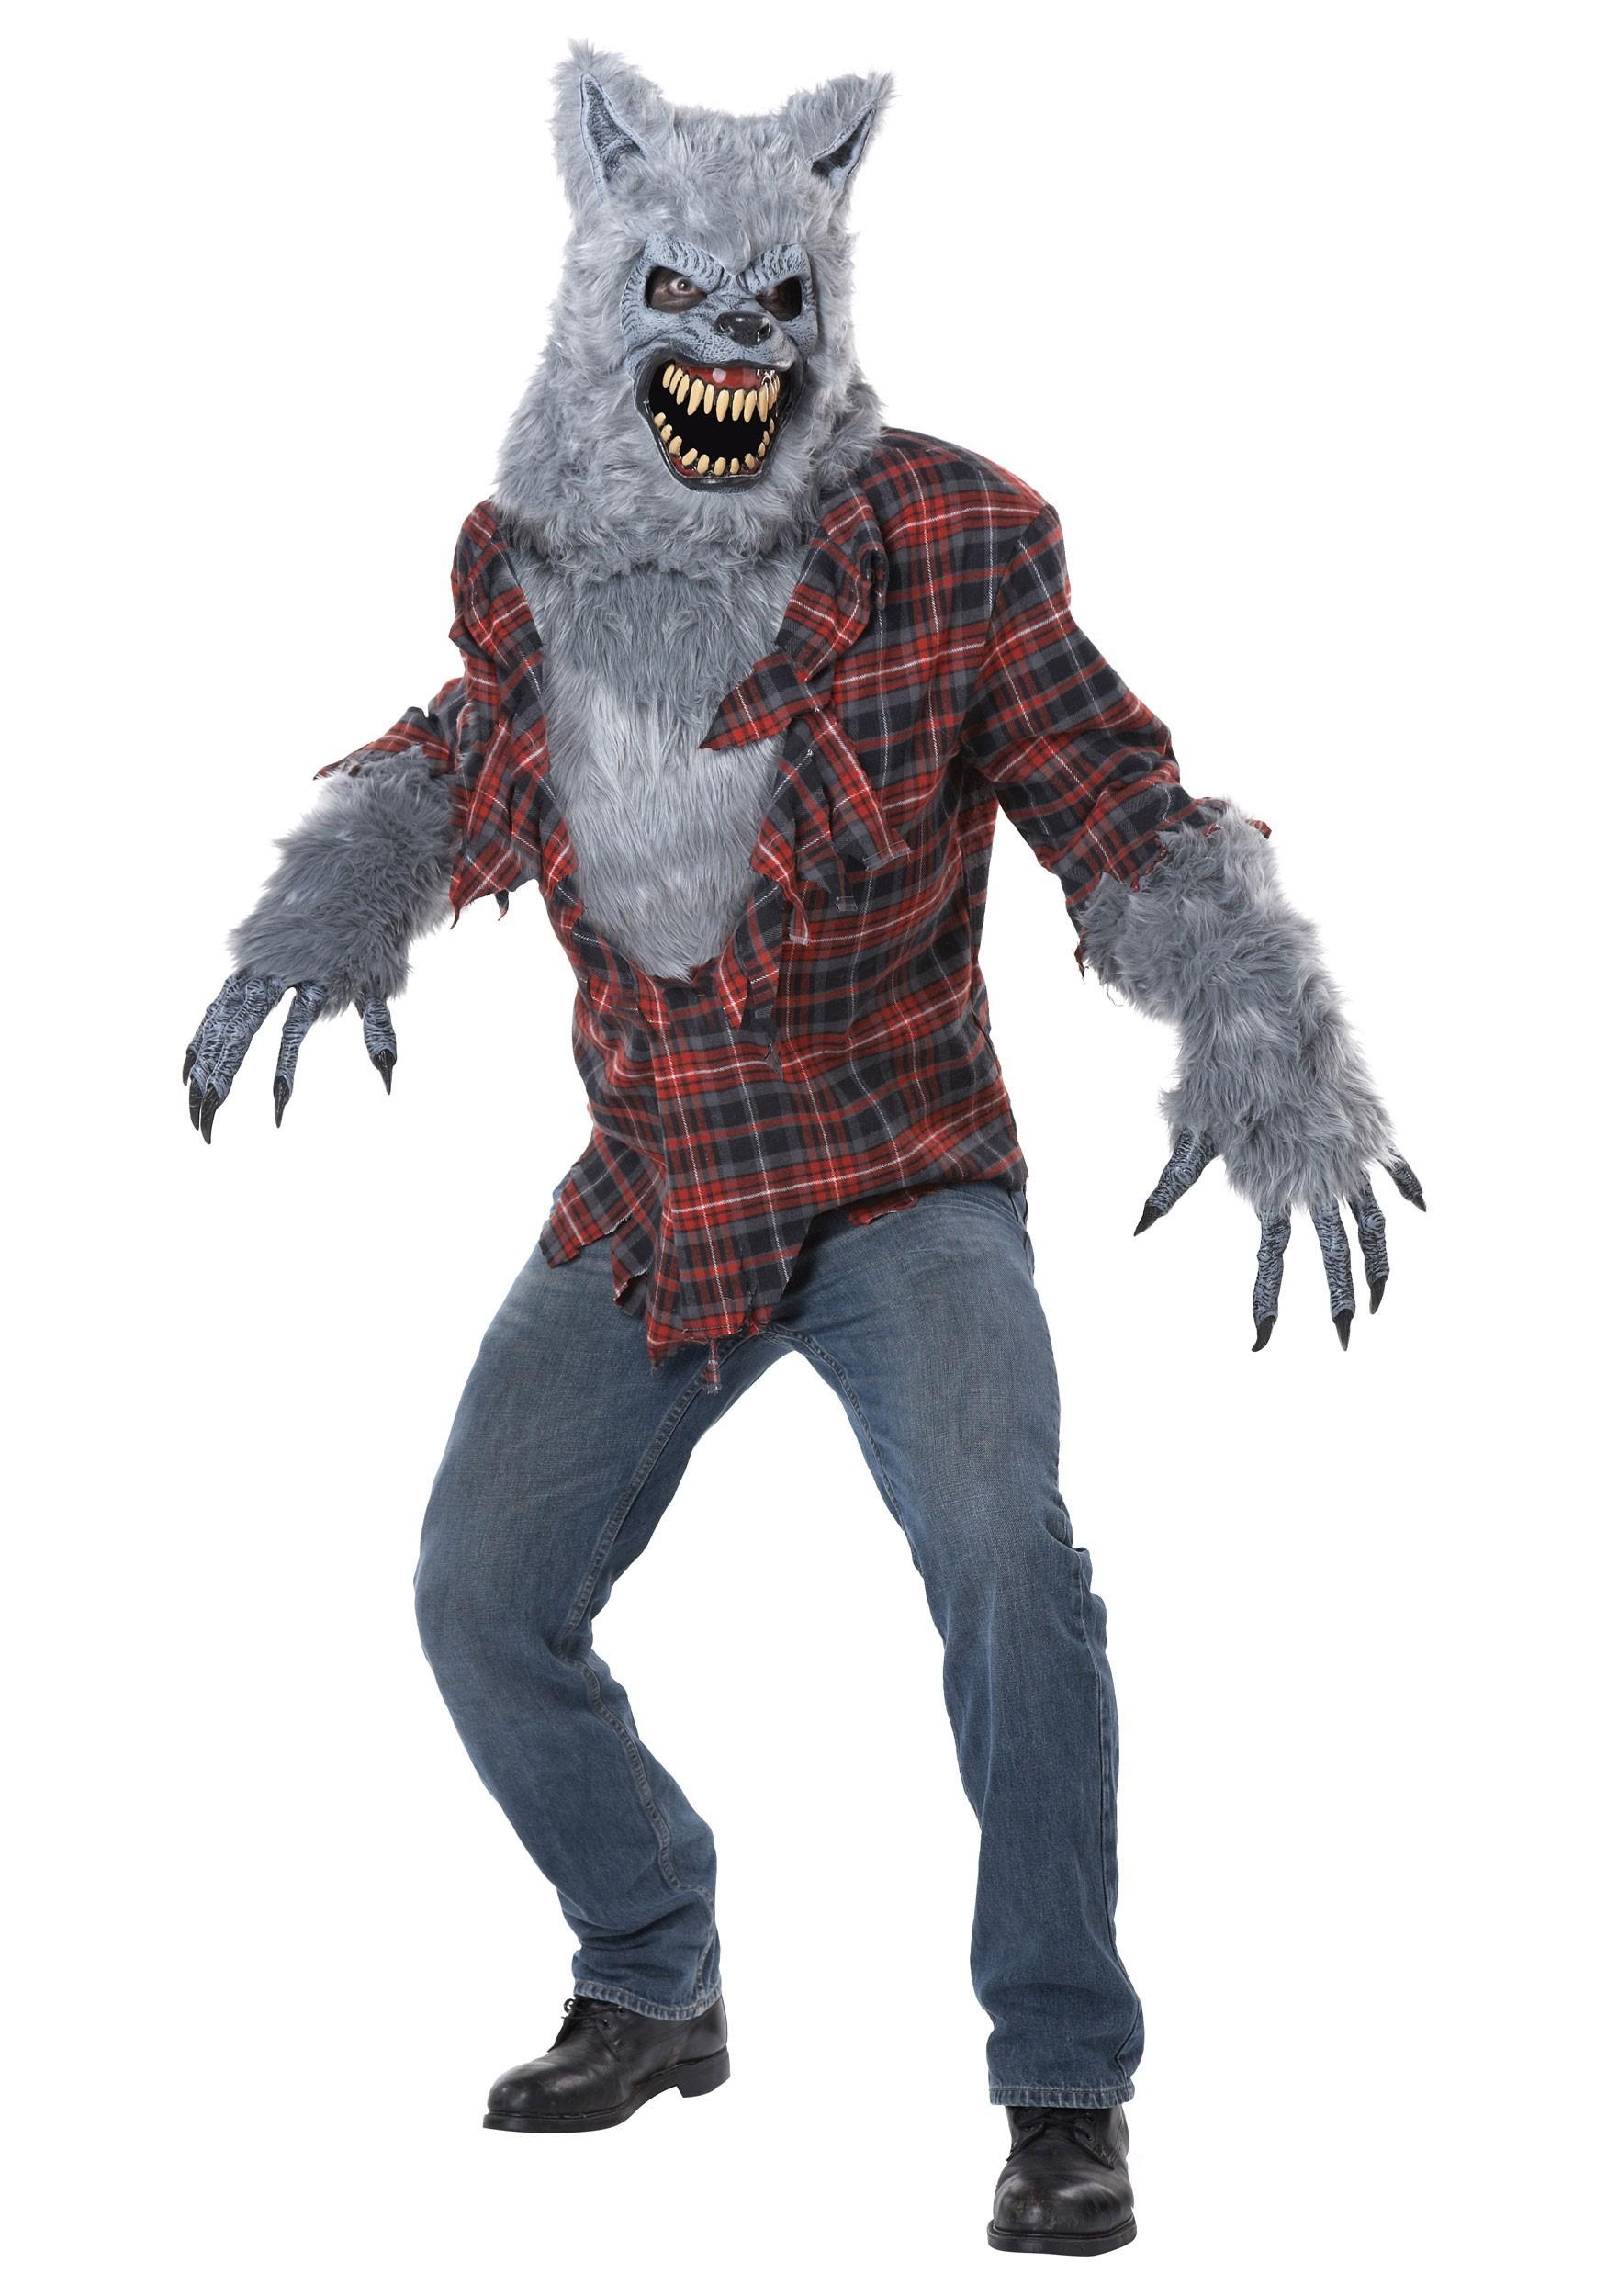 Werewolf Costumes Cake Ideas And Designs